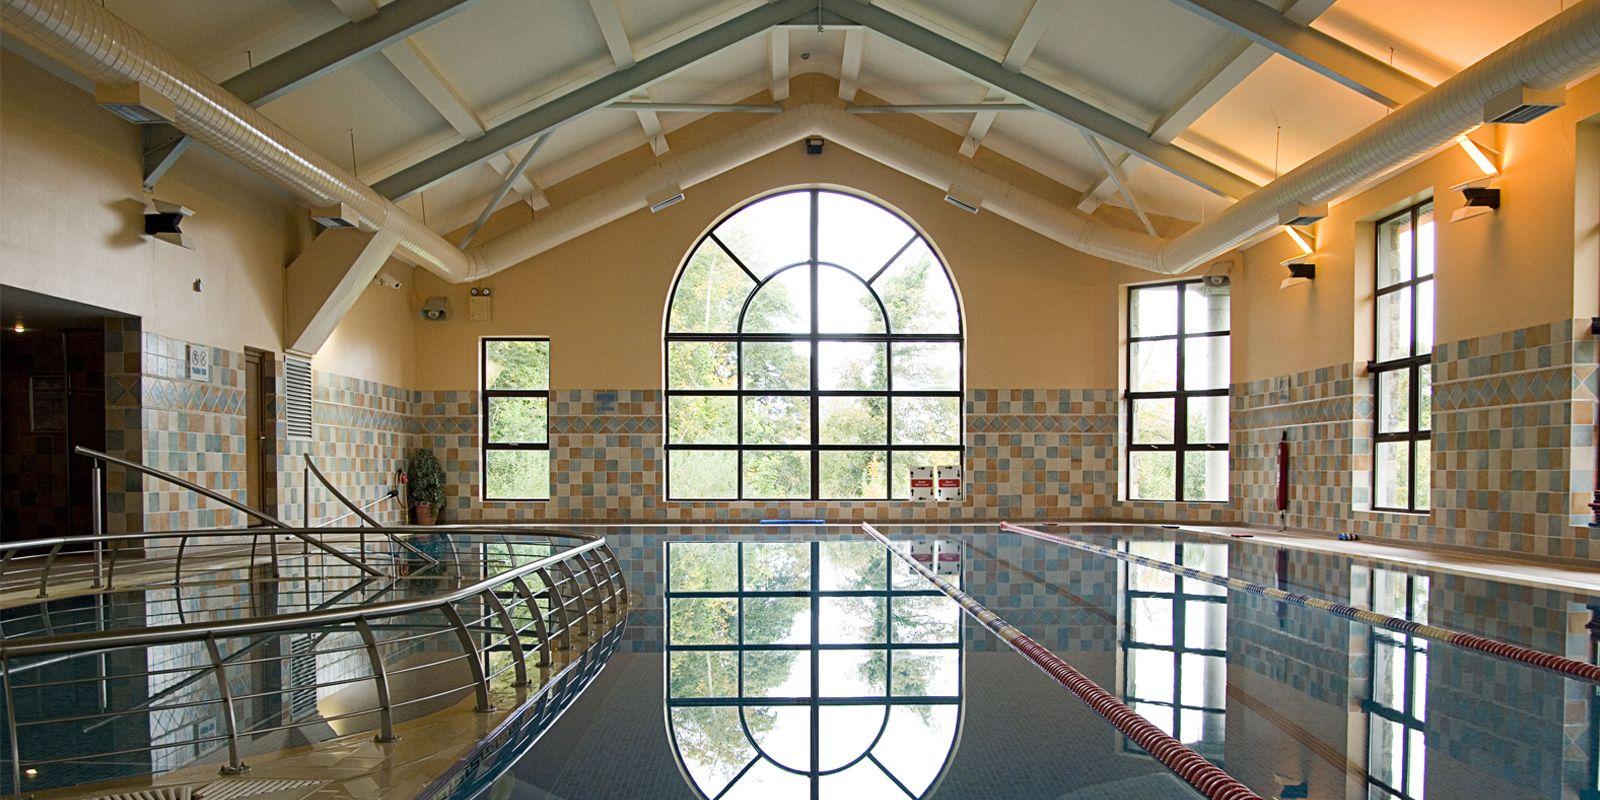 Spa Deals Westport Mayo Spa Hotels Ireland Westport Woods Hotel